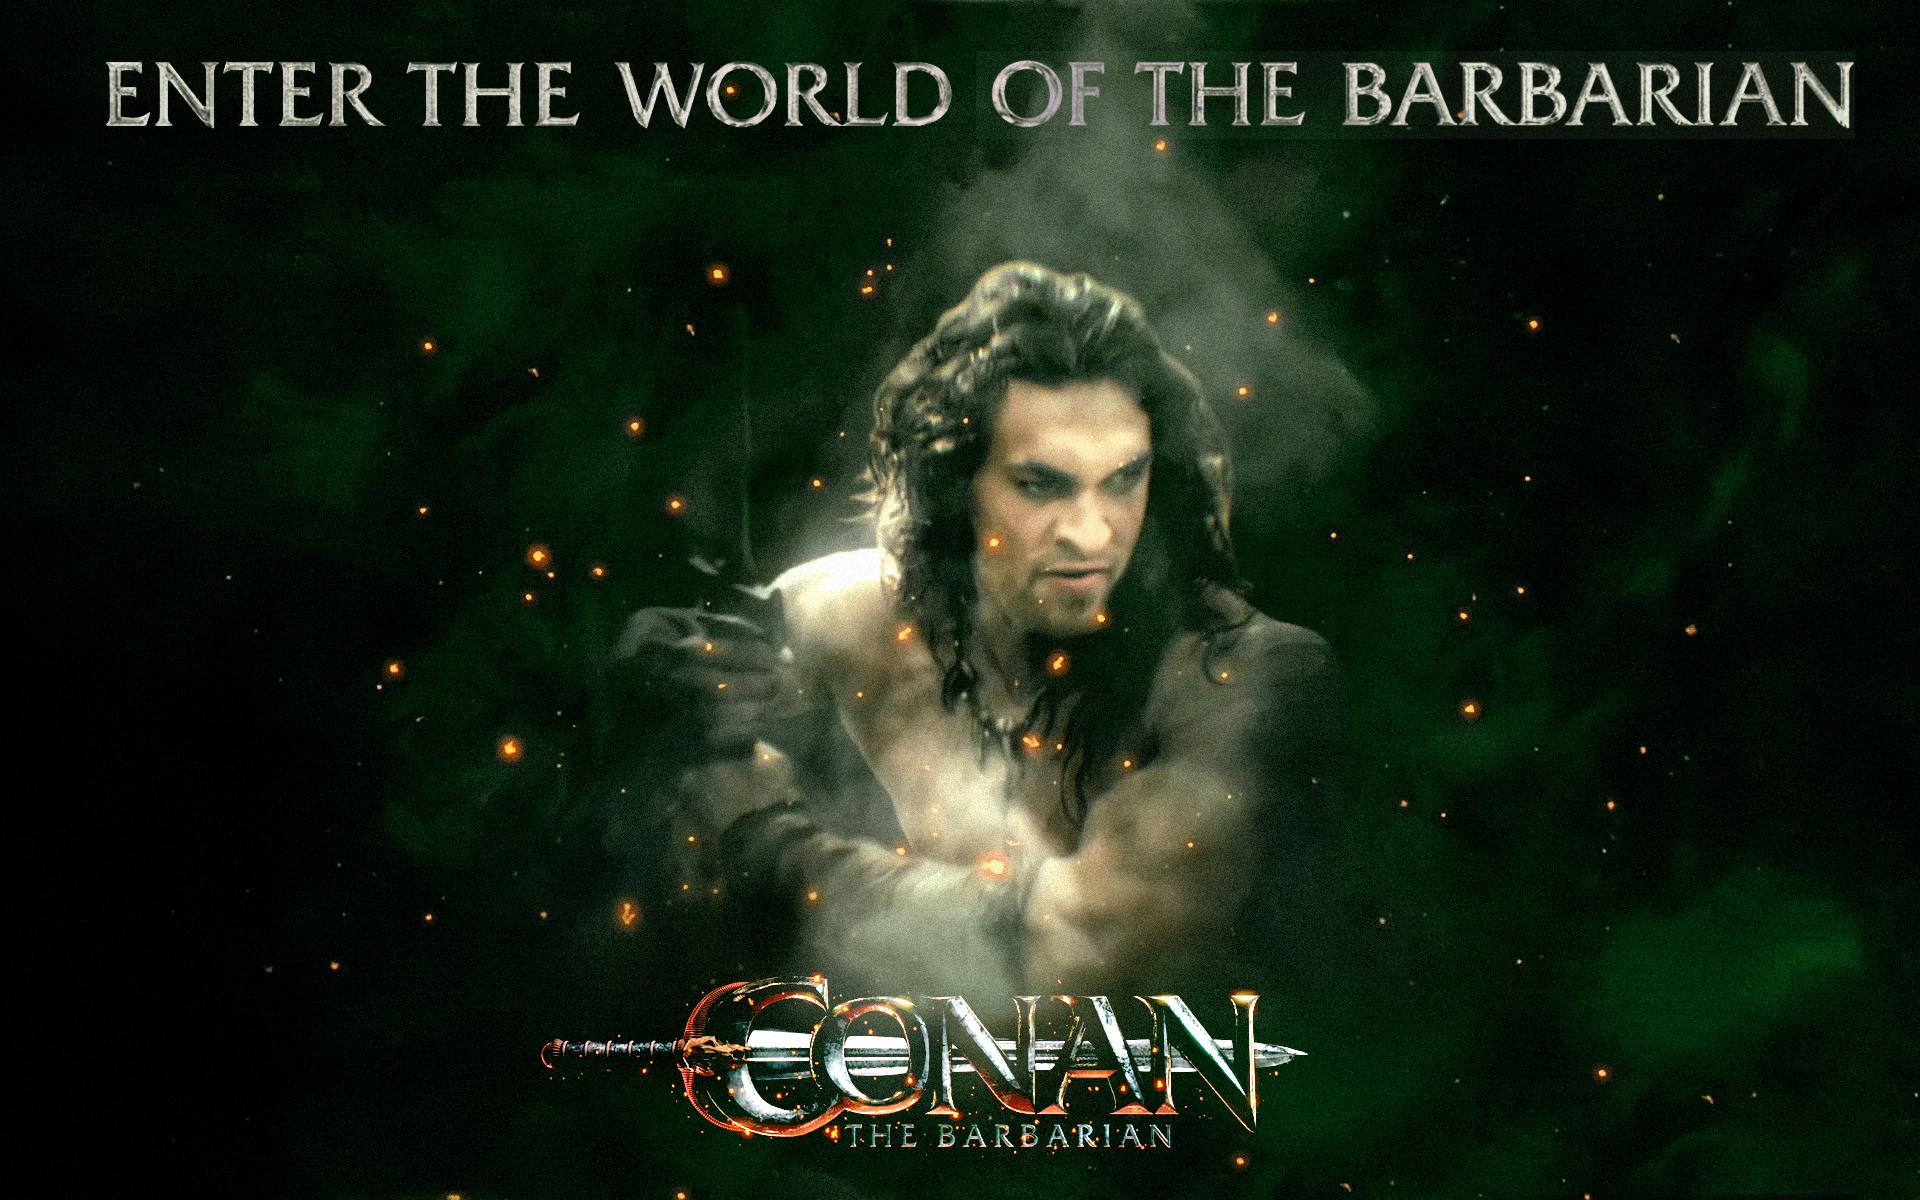 Conan The Barbarian Wallpapers 1920x1200 2 1920x1200